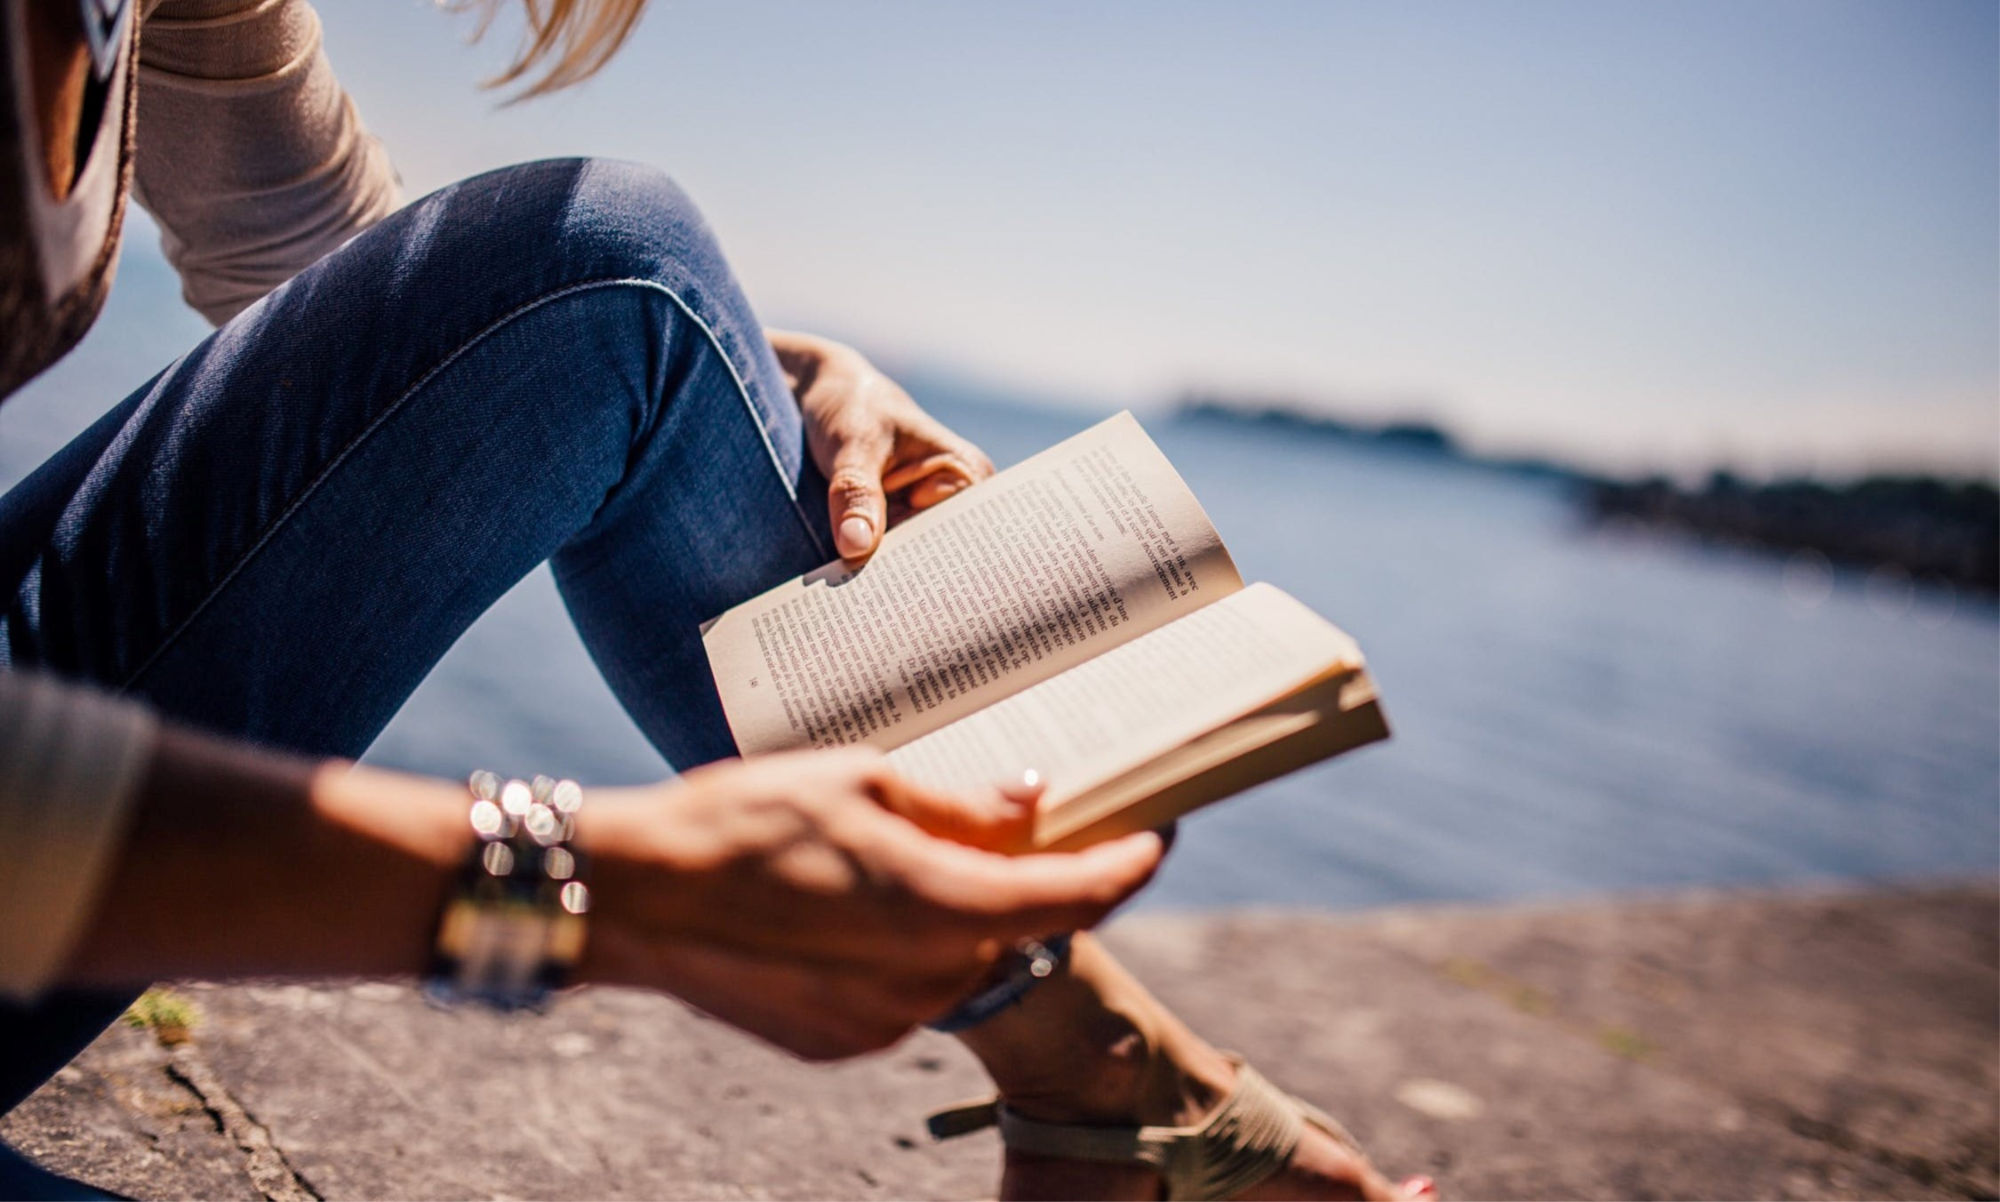 Woman Reading Book Swearing In Literature